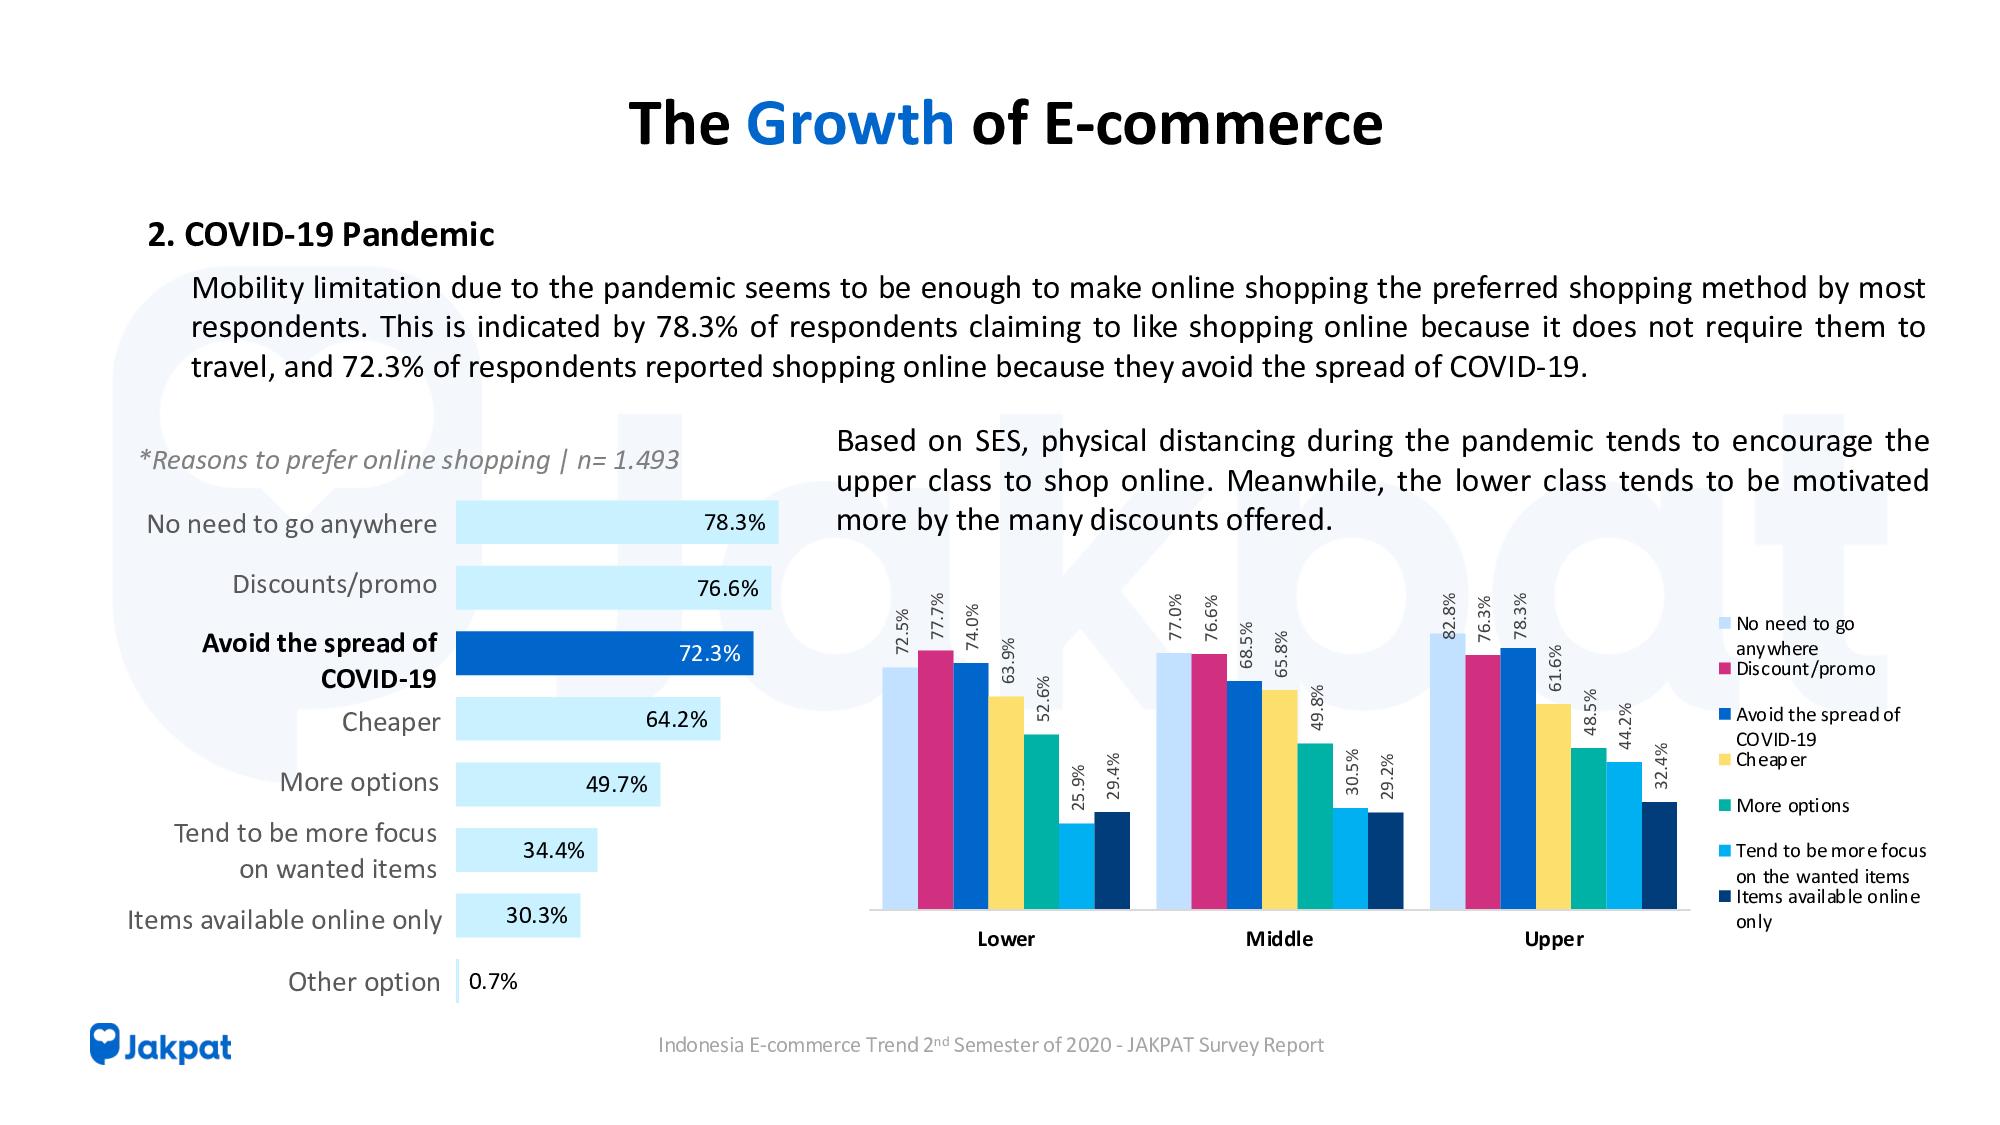 Indonesia E-commerce Trend Semester 2 of 2020 - JAKPAT Survey Report FREE version-10